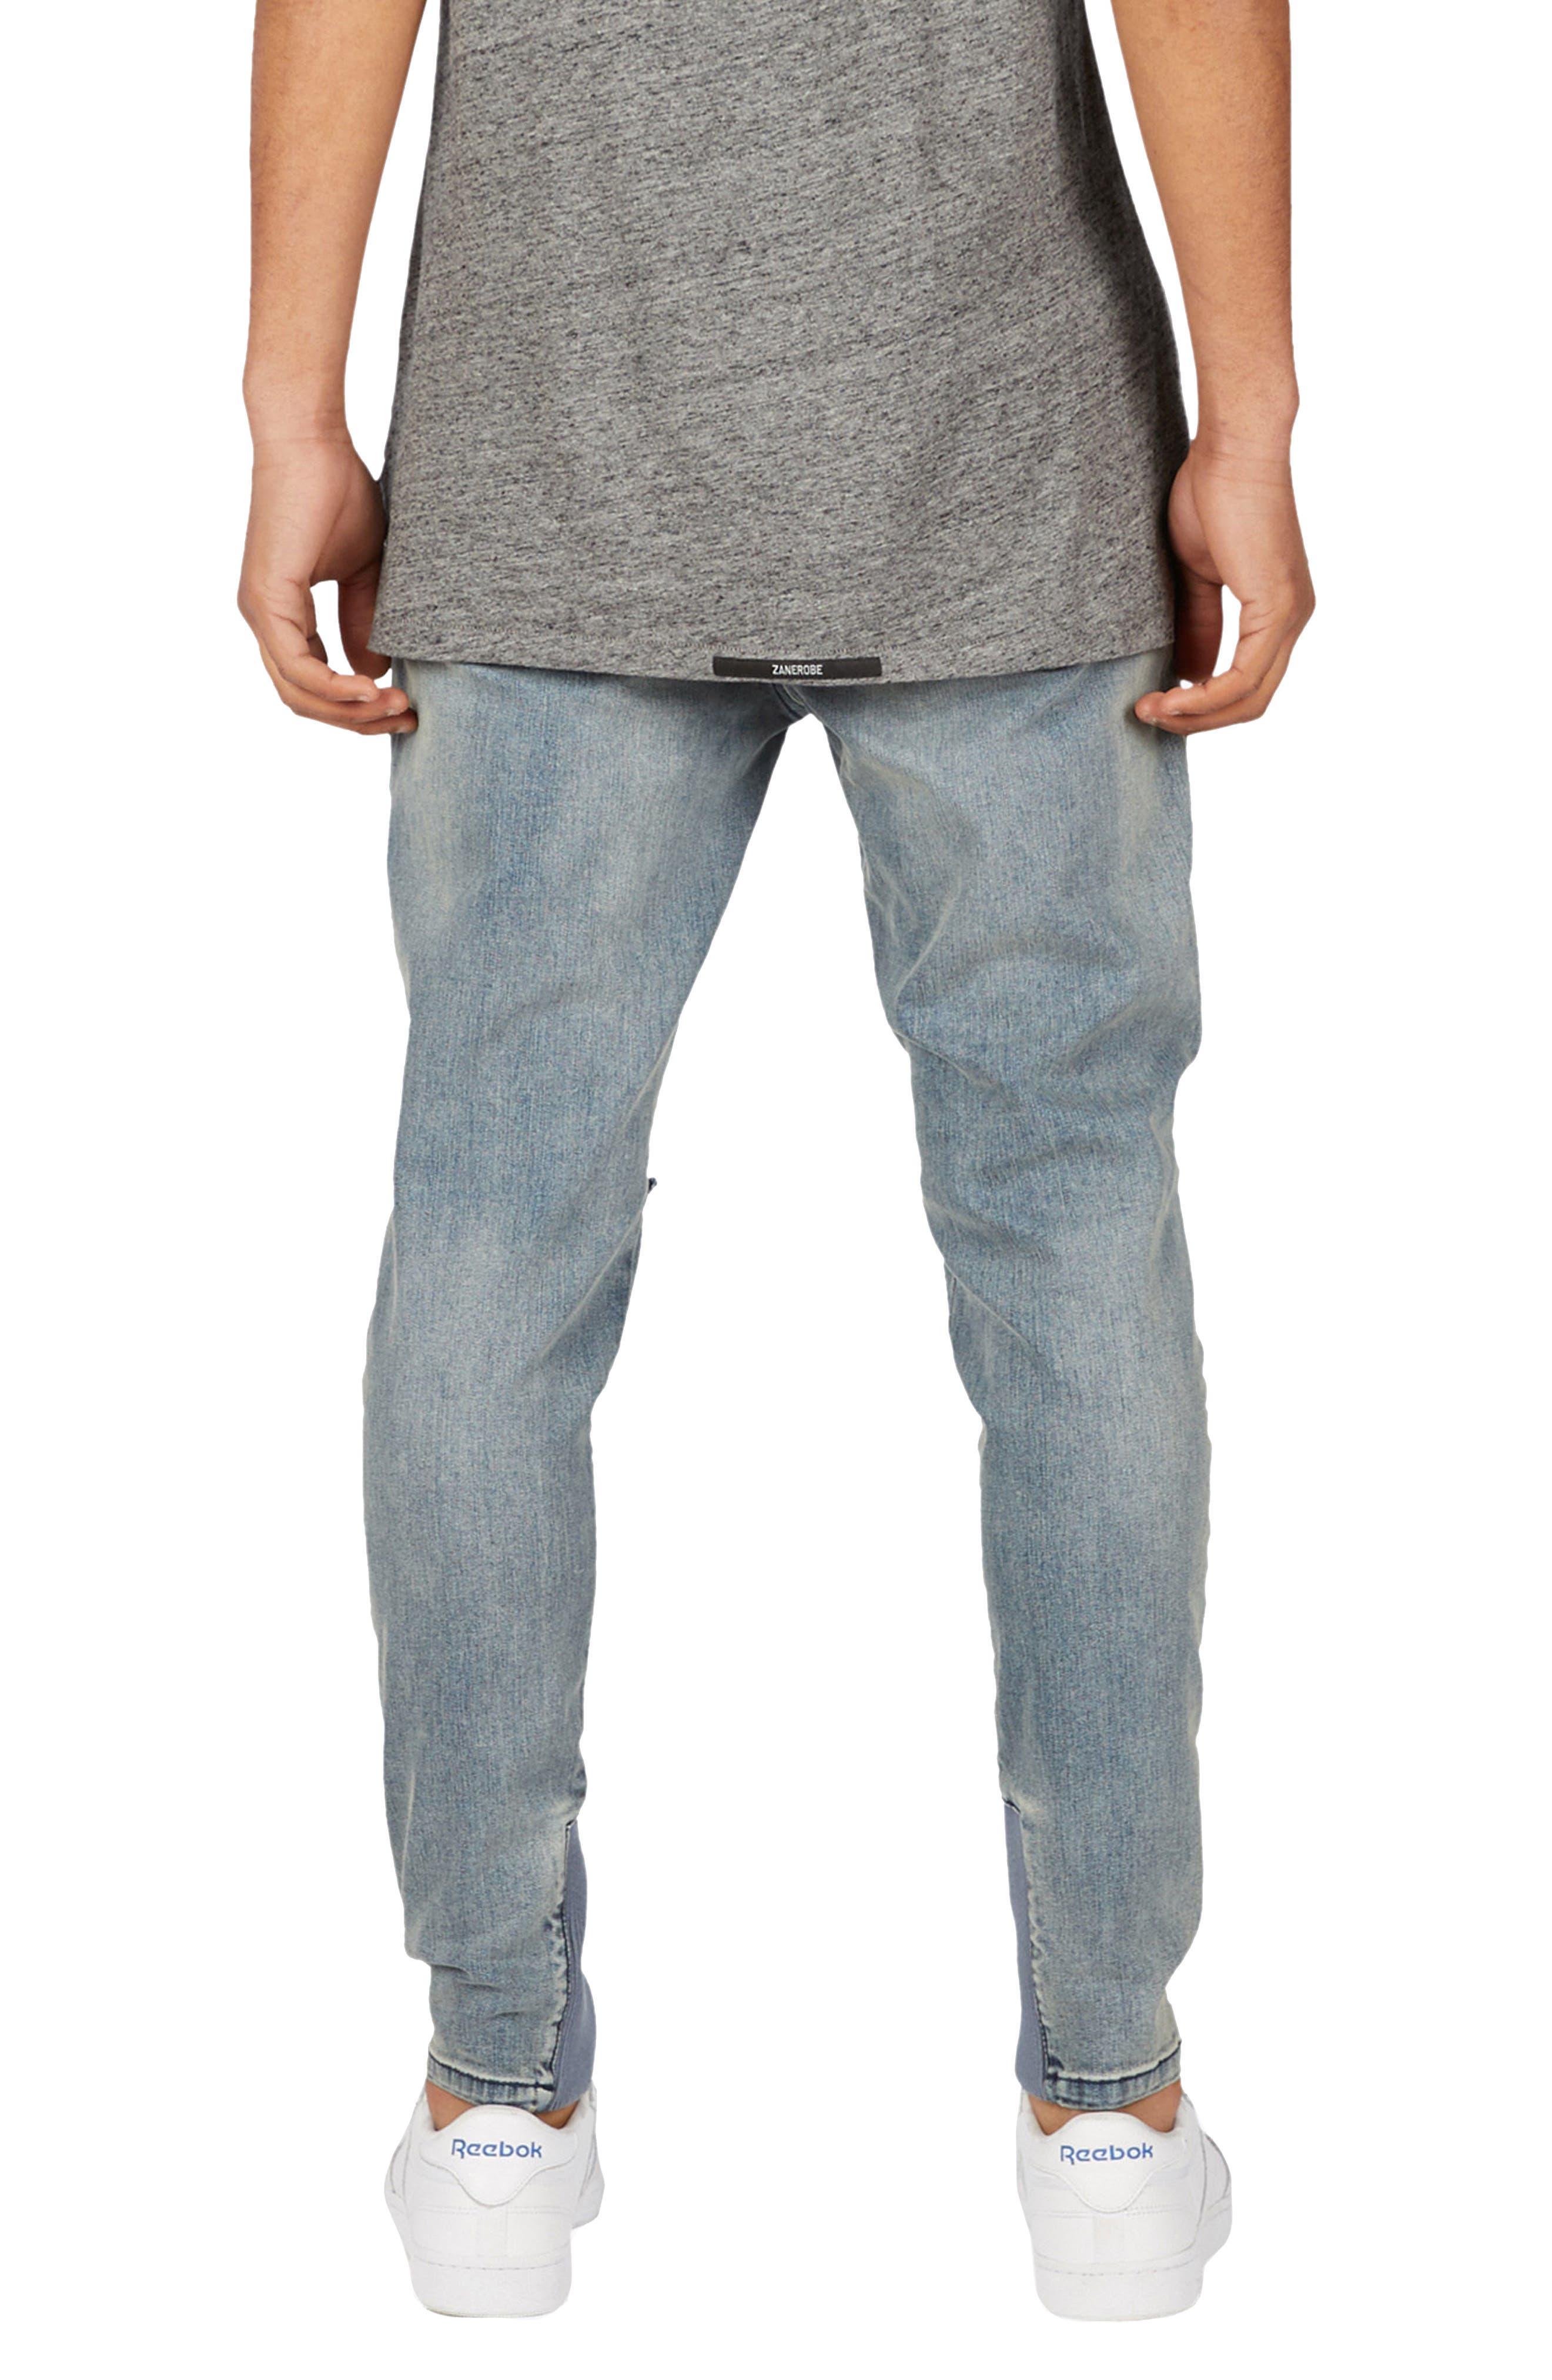 Sharpshot Slouchy Slim Fit Jeans,                             Alternate thumbnail 2, color,                             Double Indigo